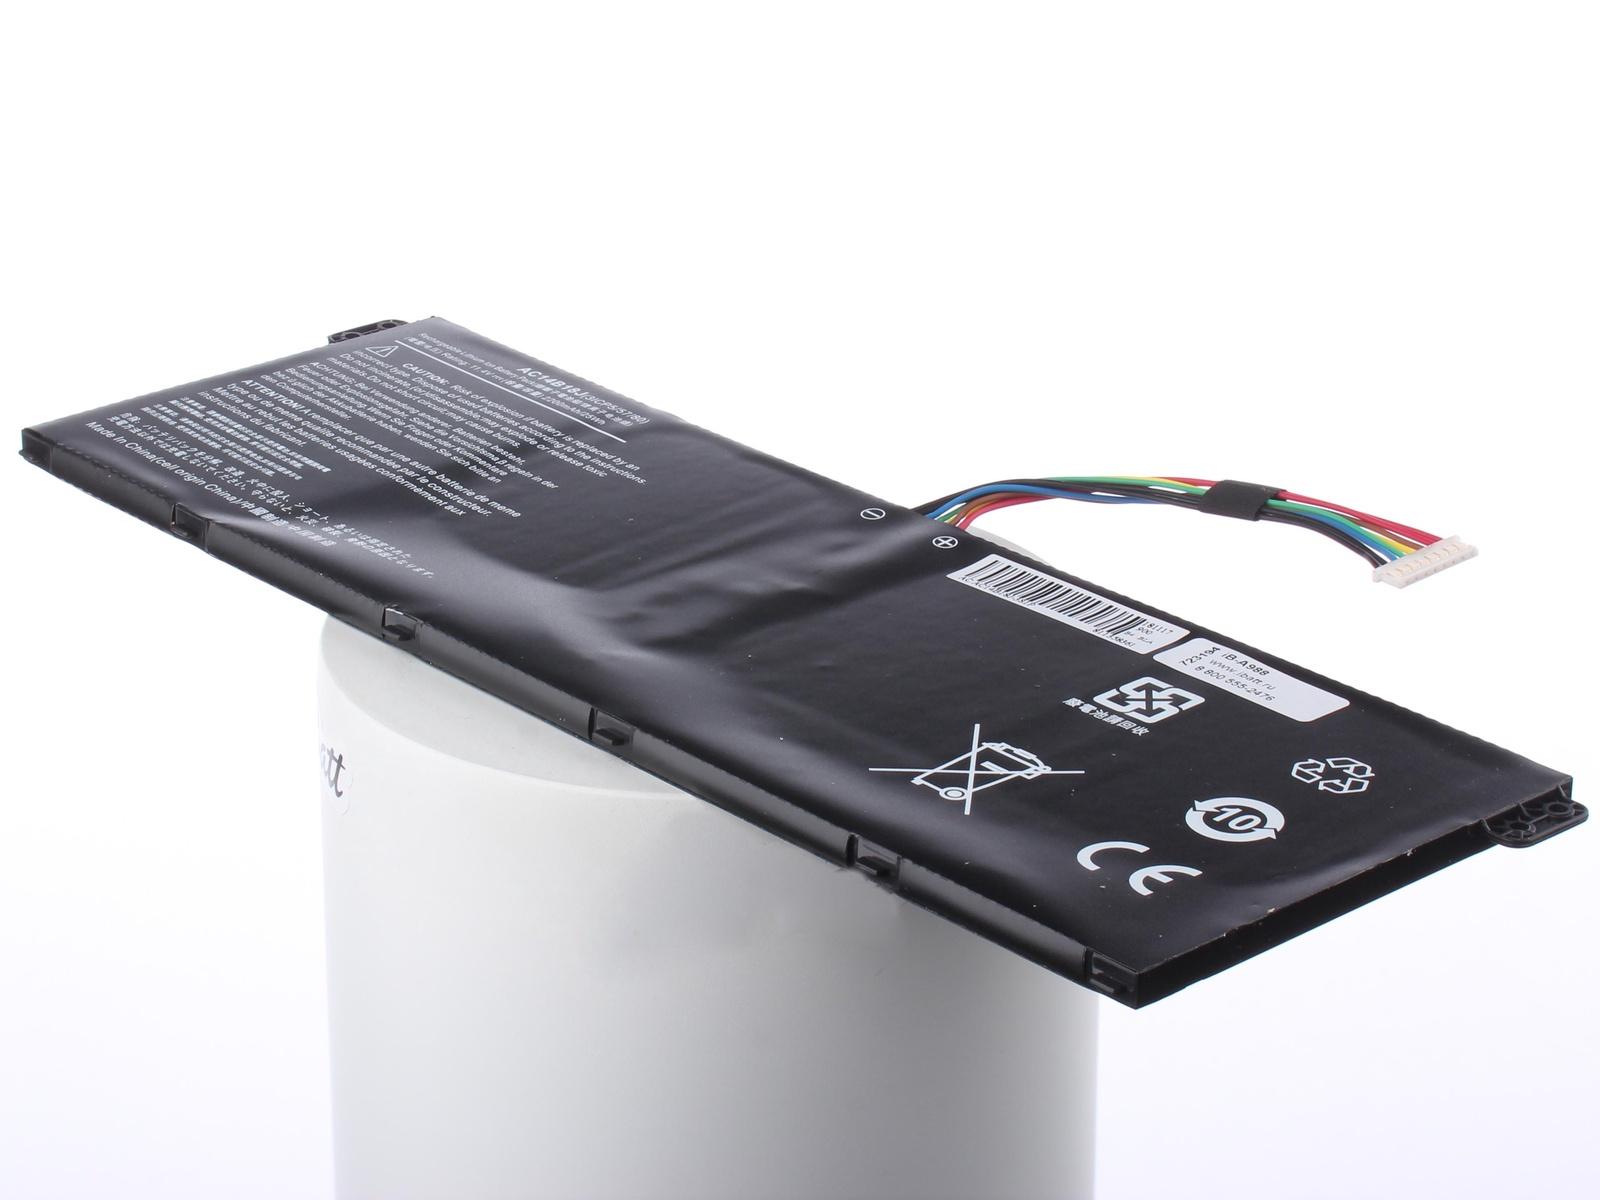 Аккумуляторная батарея iBatt iB-T4-A988 3220mAh для ноутбуков Acer Aspire ES1-731G-P25D, ASPIRE ES1-331-C1KO, Aspire ES1-331-P2KU, Aspire ES1-331-C4NZ, ASPIRE ES1-531-C432, ASPIRE ES1-531-P5DN, Aspire ES1-731G-C4E3, Aspire ES1-731-P921, ноутбук acer aspire es1 731g c4e3 nx mzter 012